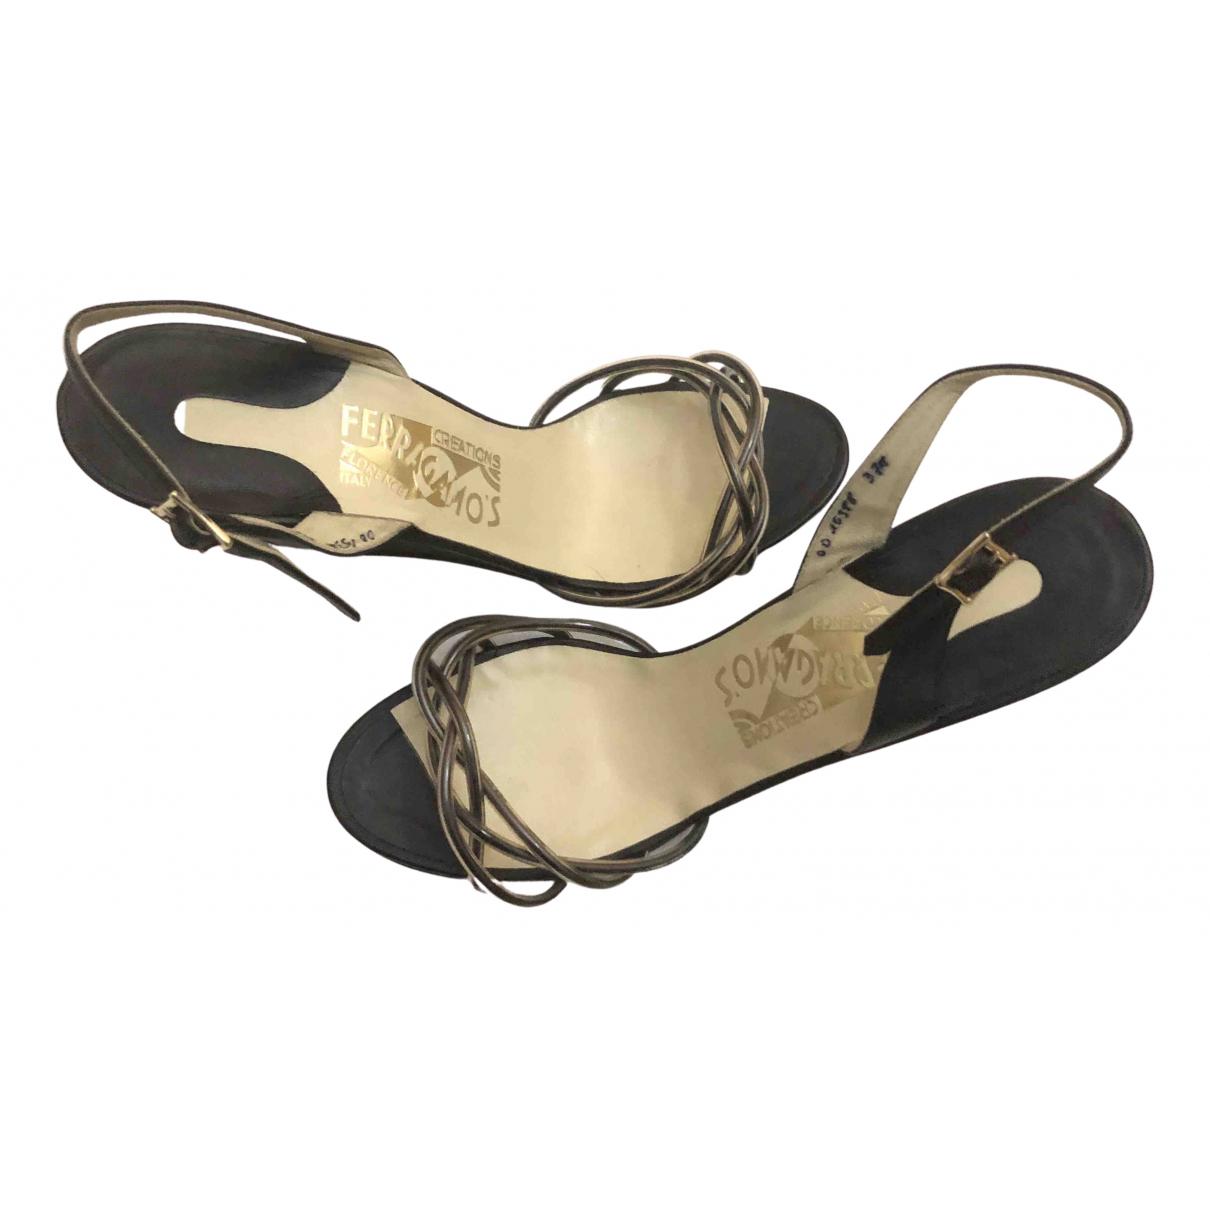 Sandalias romanas de Cuero Salvatore Ferragamo